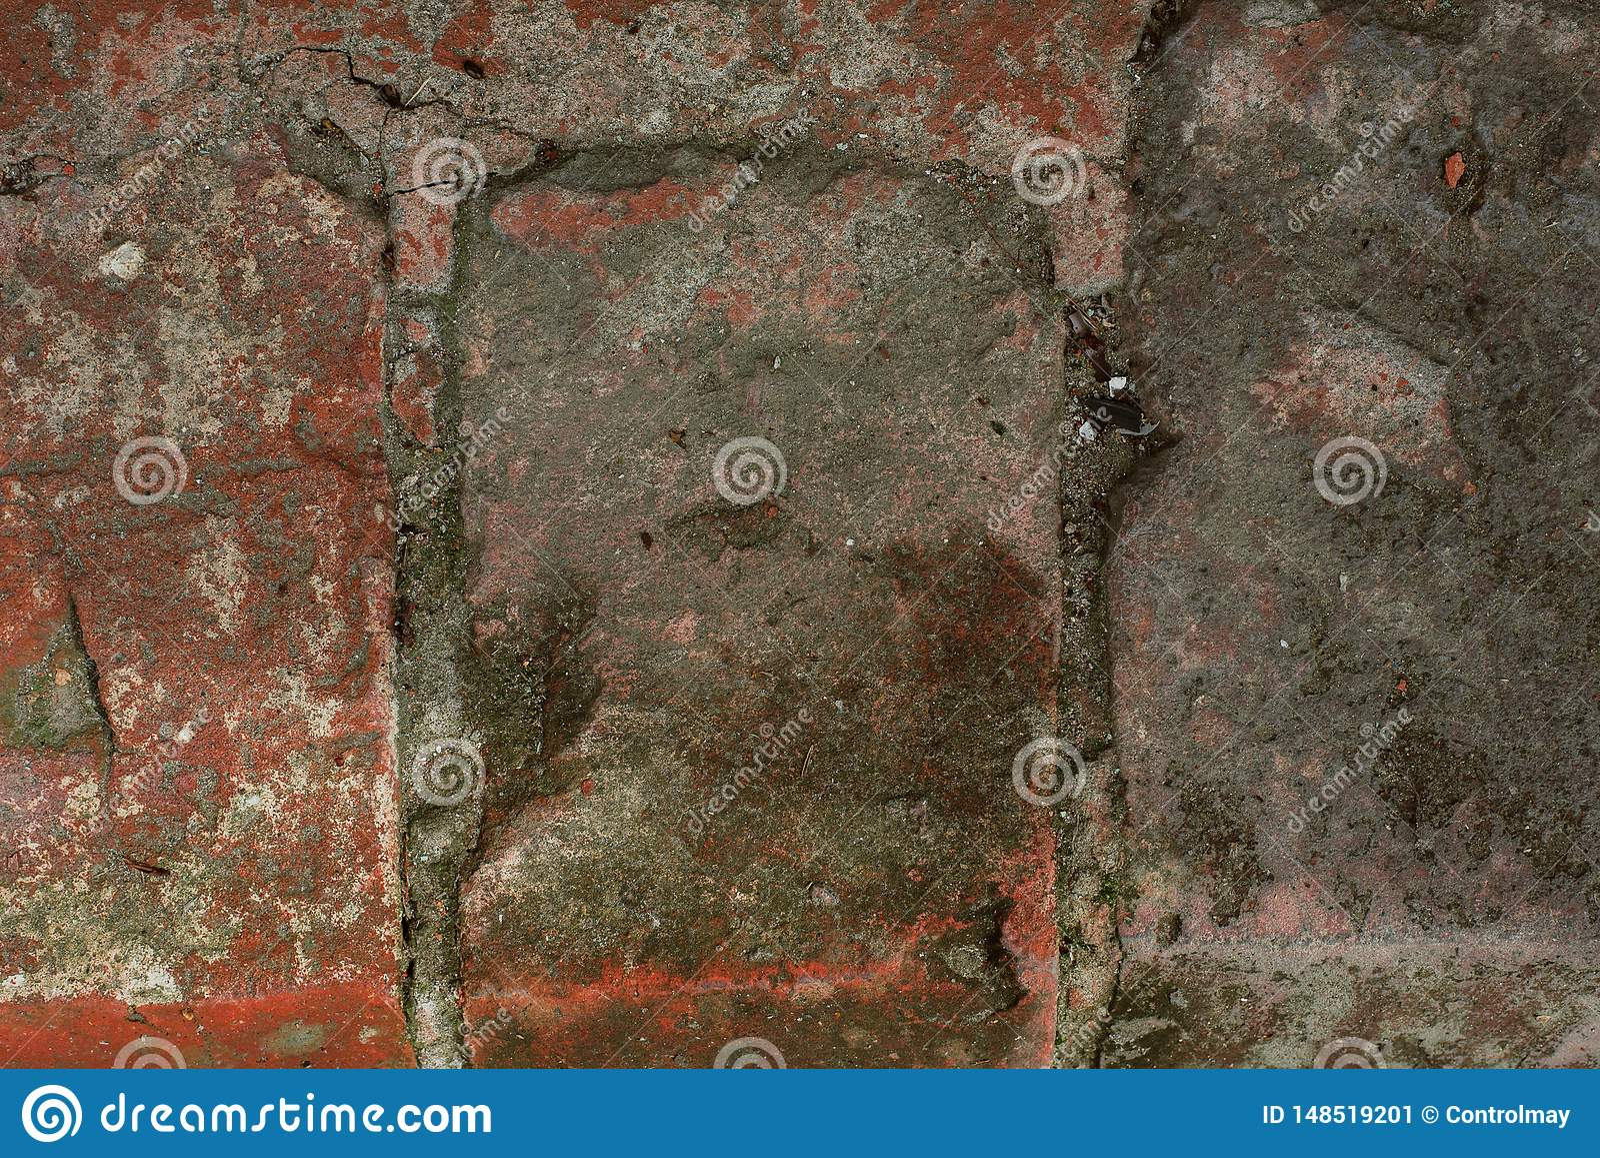 Schmutzige defekte Wand sehr nah